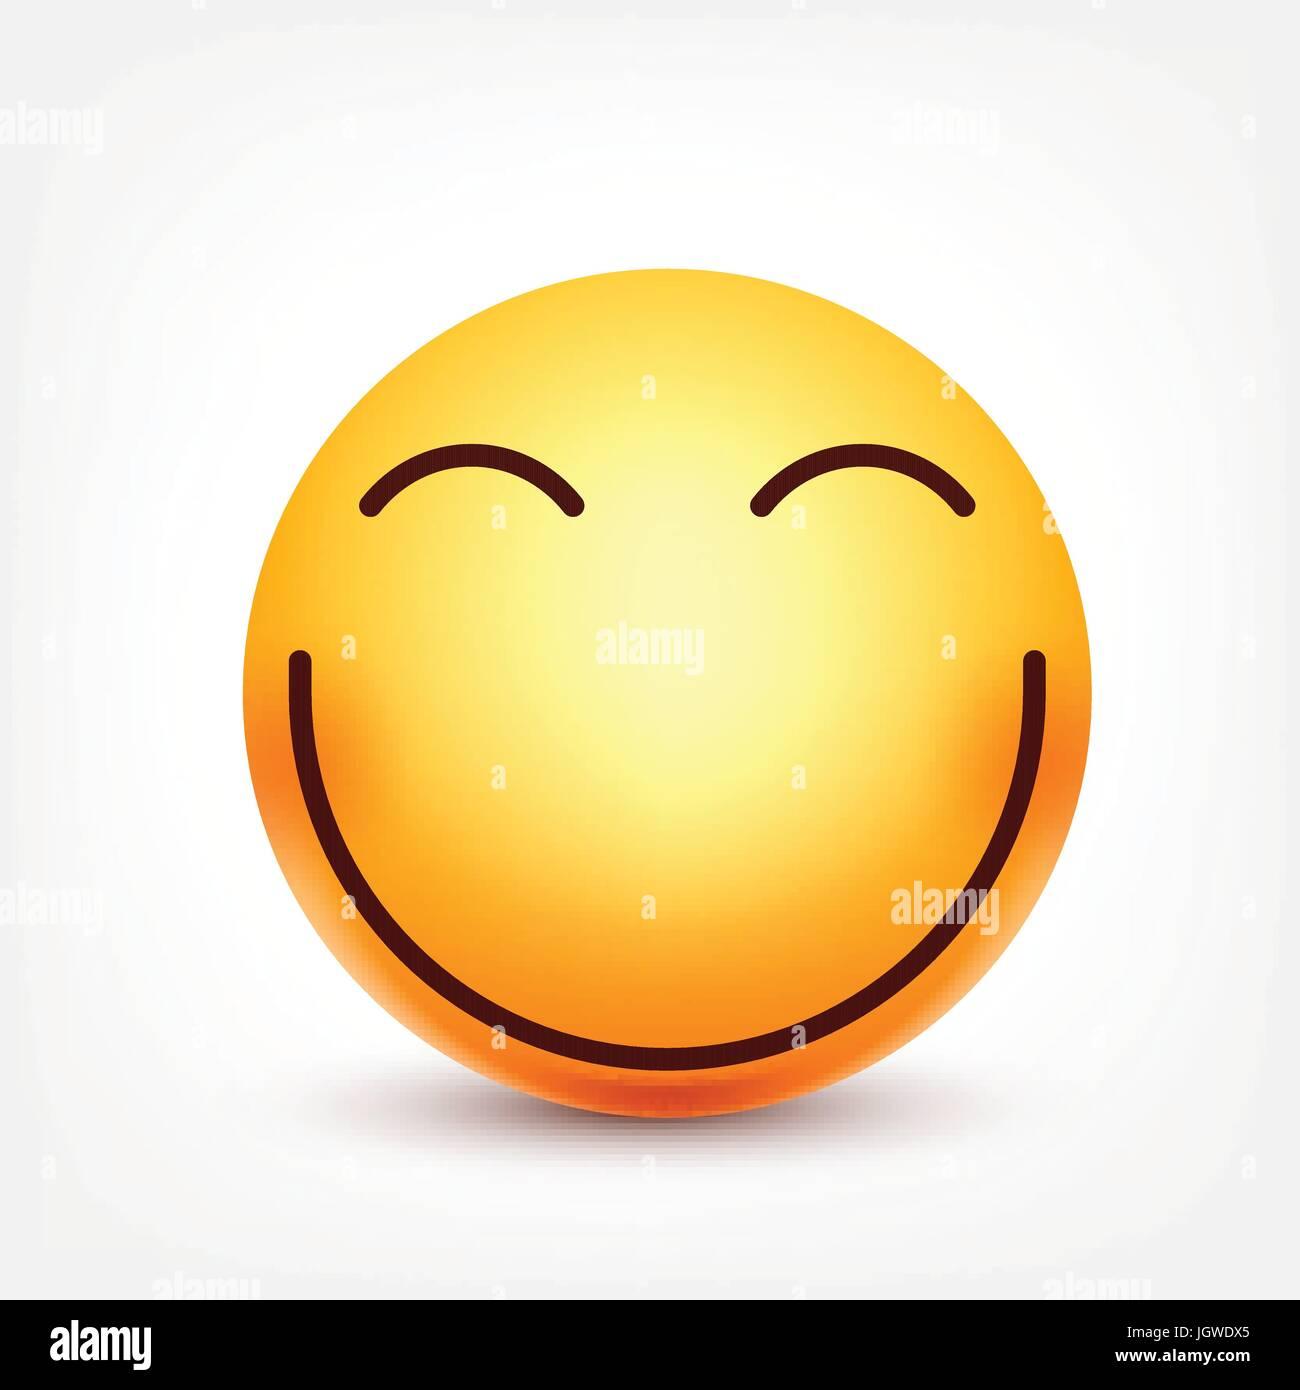 Smileyemoticon yellow face with emotions facial expression 3d smileyemoticon yellow face with emotions facial expression 3d realistic emoji sadhappyangry facesfunny cartoon characterod web icon buycottarizona Choice Image